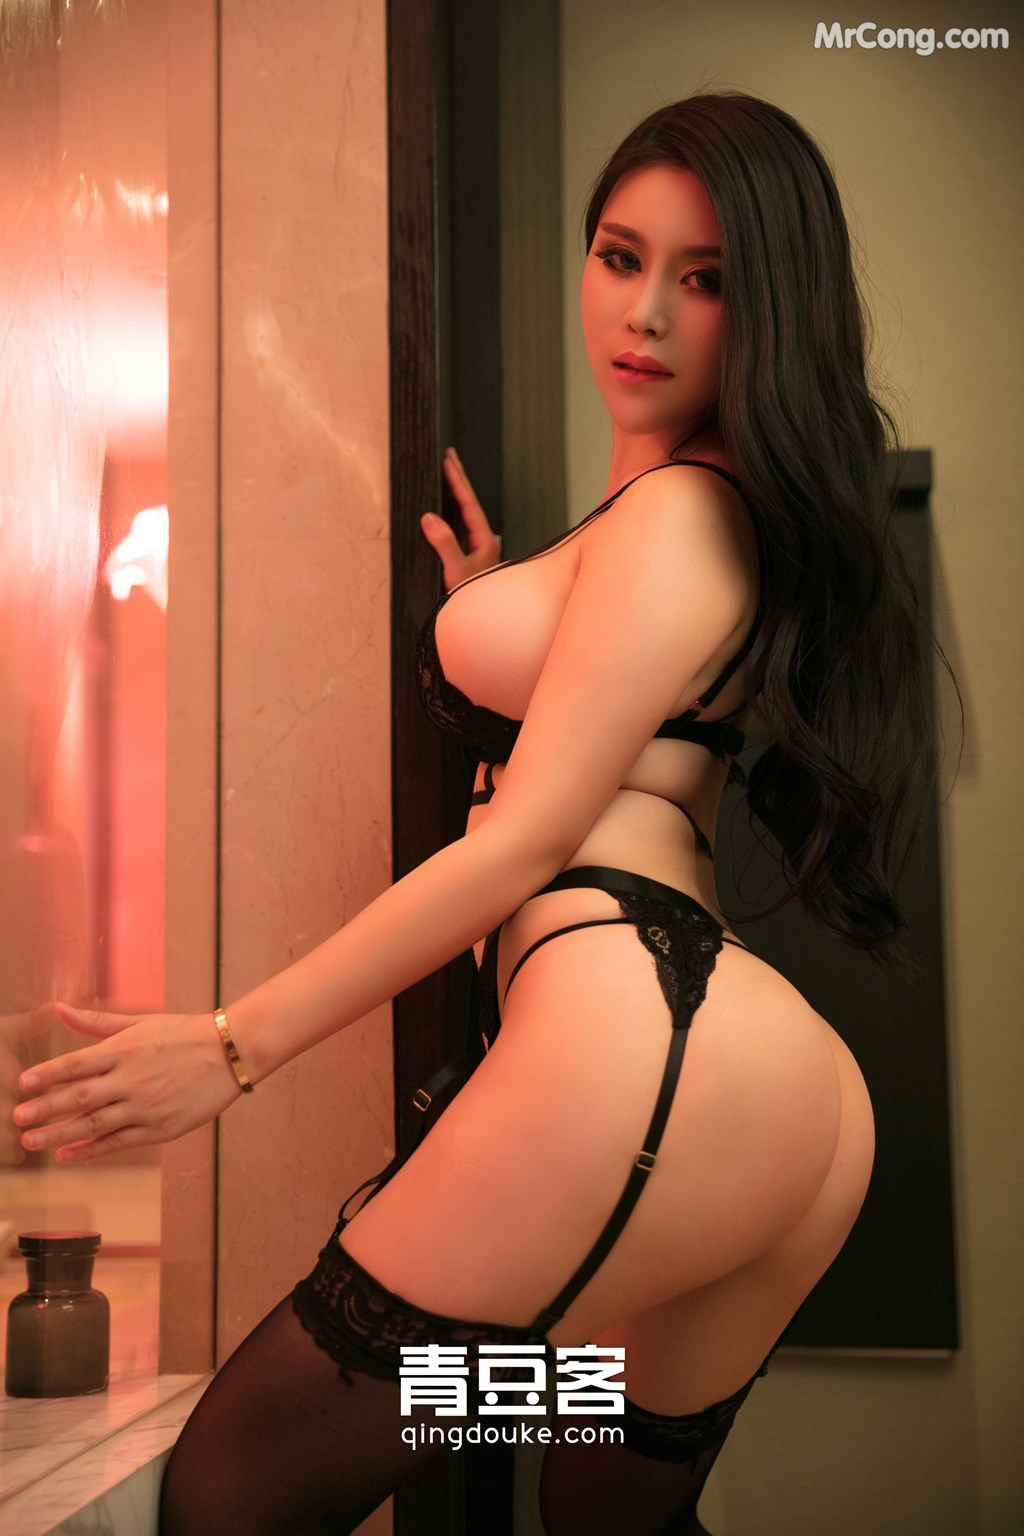 Image QingDouKe-2017-11-05-Ke-Rui-Na-MrCong.com-042 in post QingDouKe 2017-11-05: Người mẫu Ke Rui Na (可蕊娜) (48 ảnh)